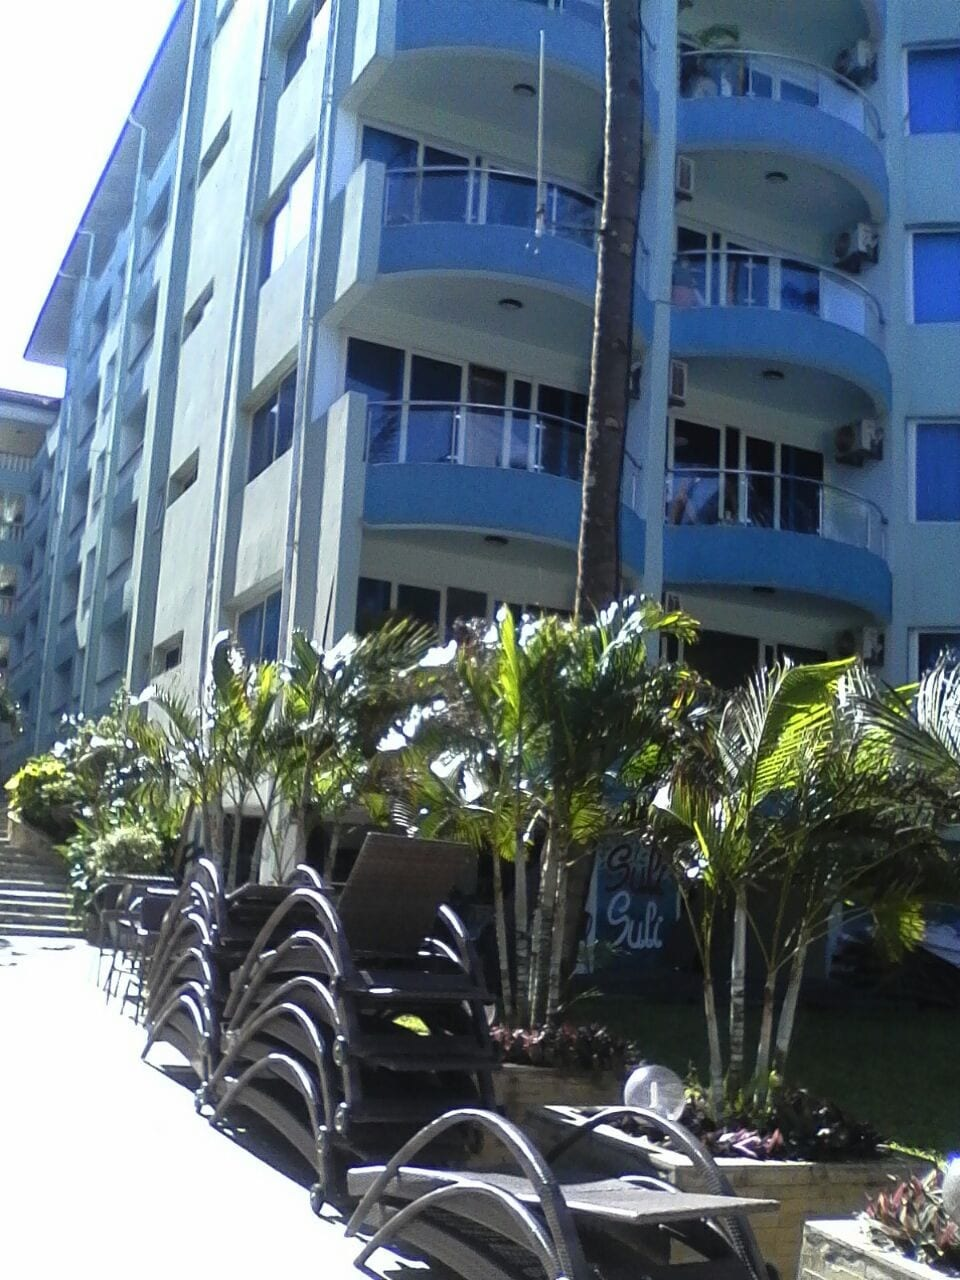 bamburi beach apartment apartments for rent in mombasa mombasa county kenya